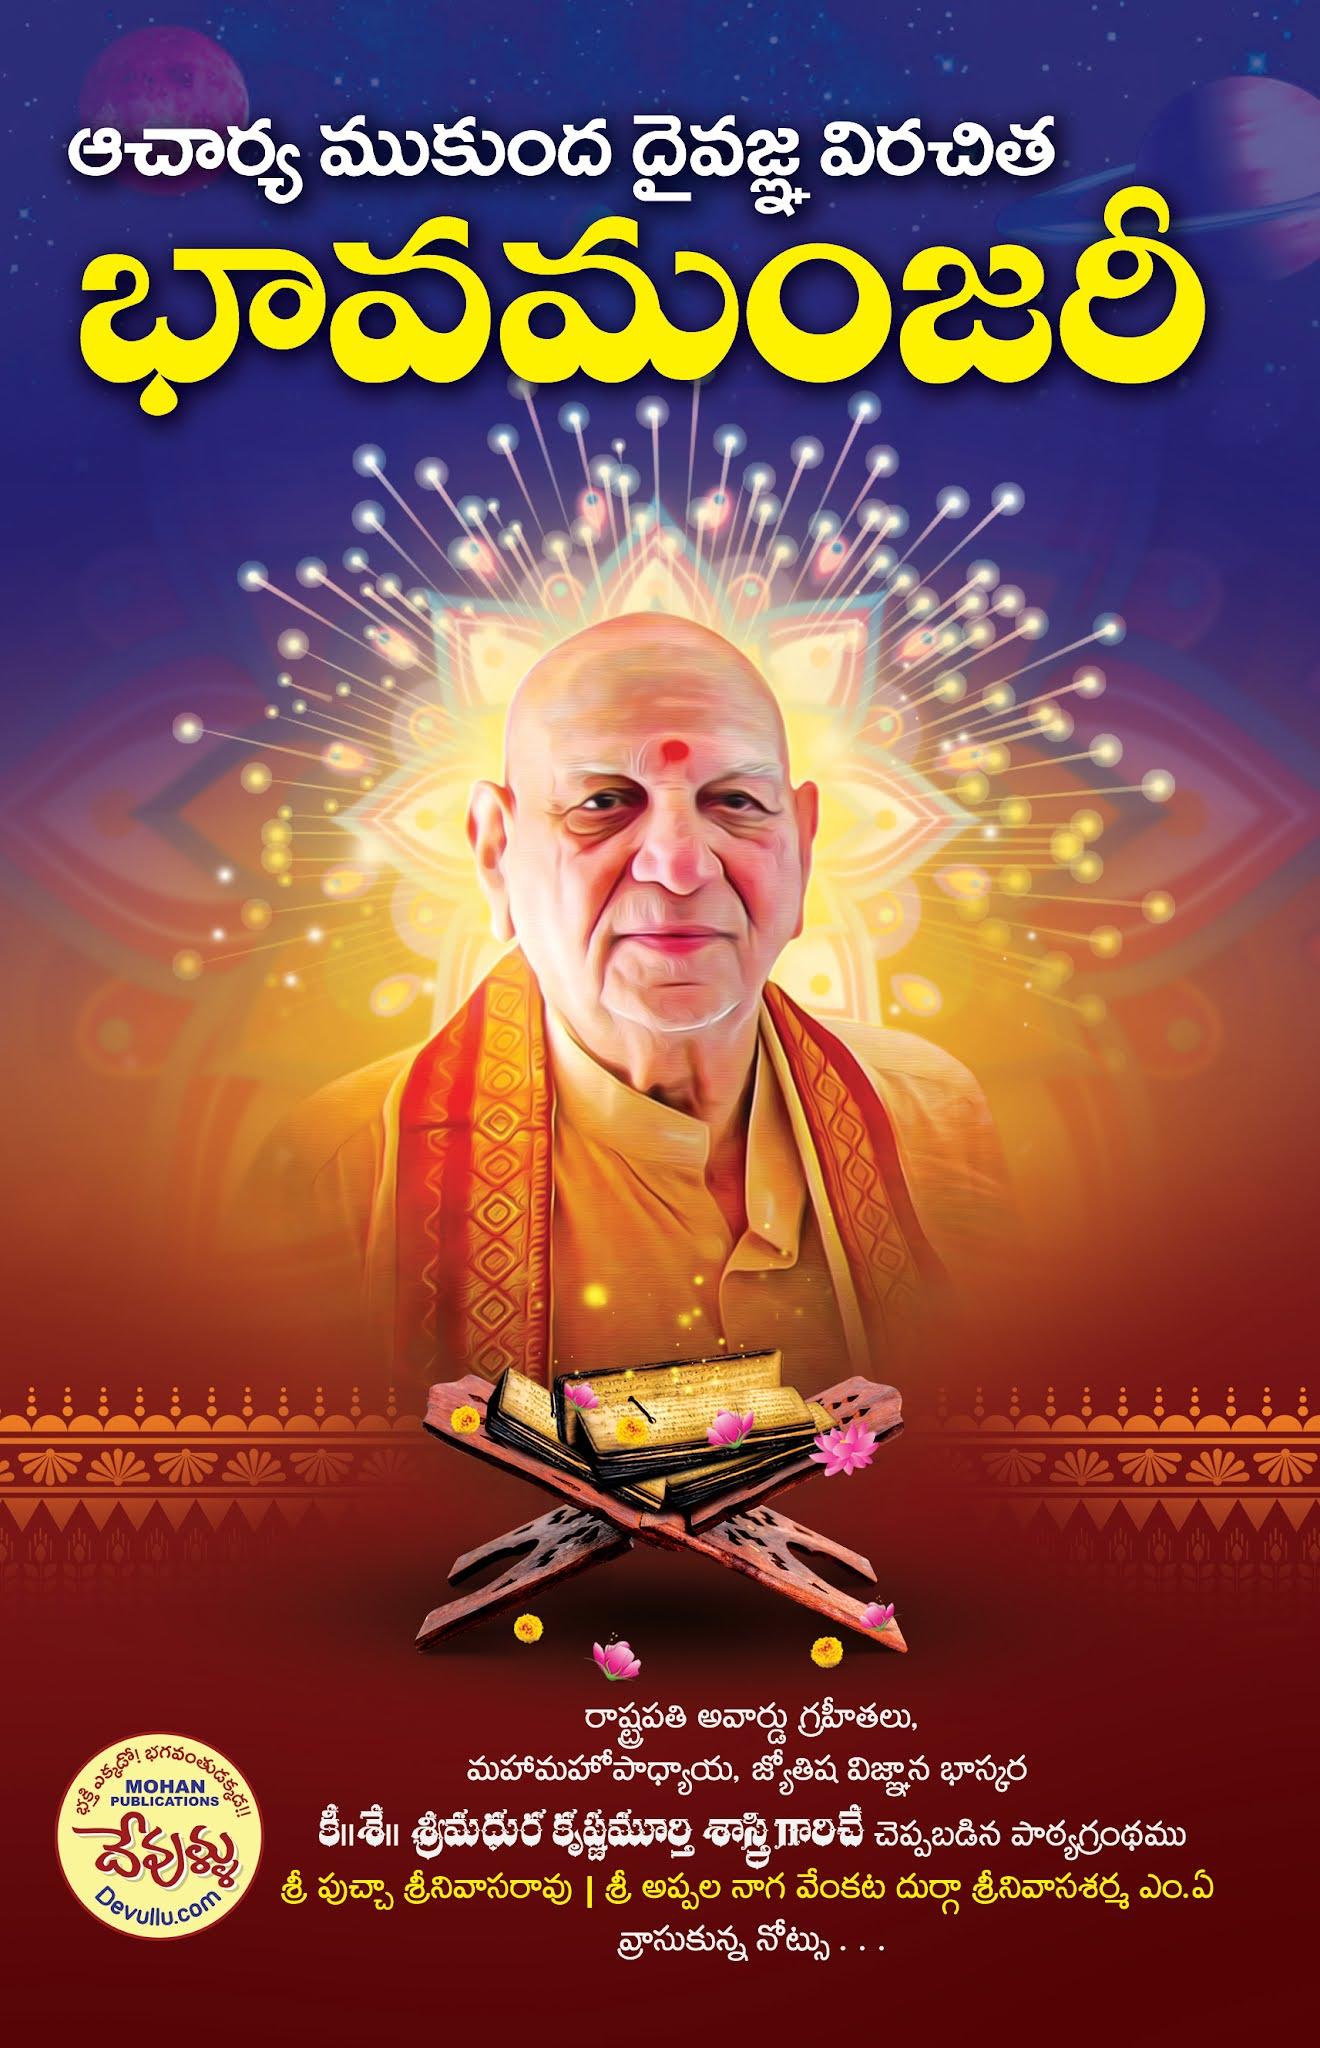 Bhava Manjari Telugu | ఆచార్య ముకుంద దైవజ్ఞ విరచిత భావ మంజరి |